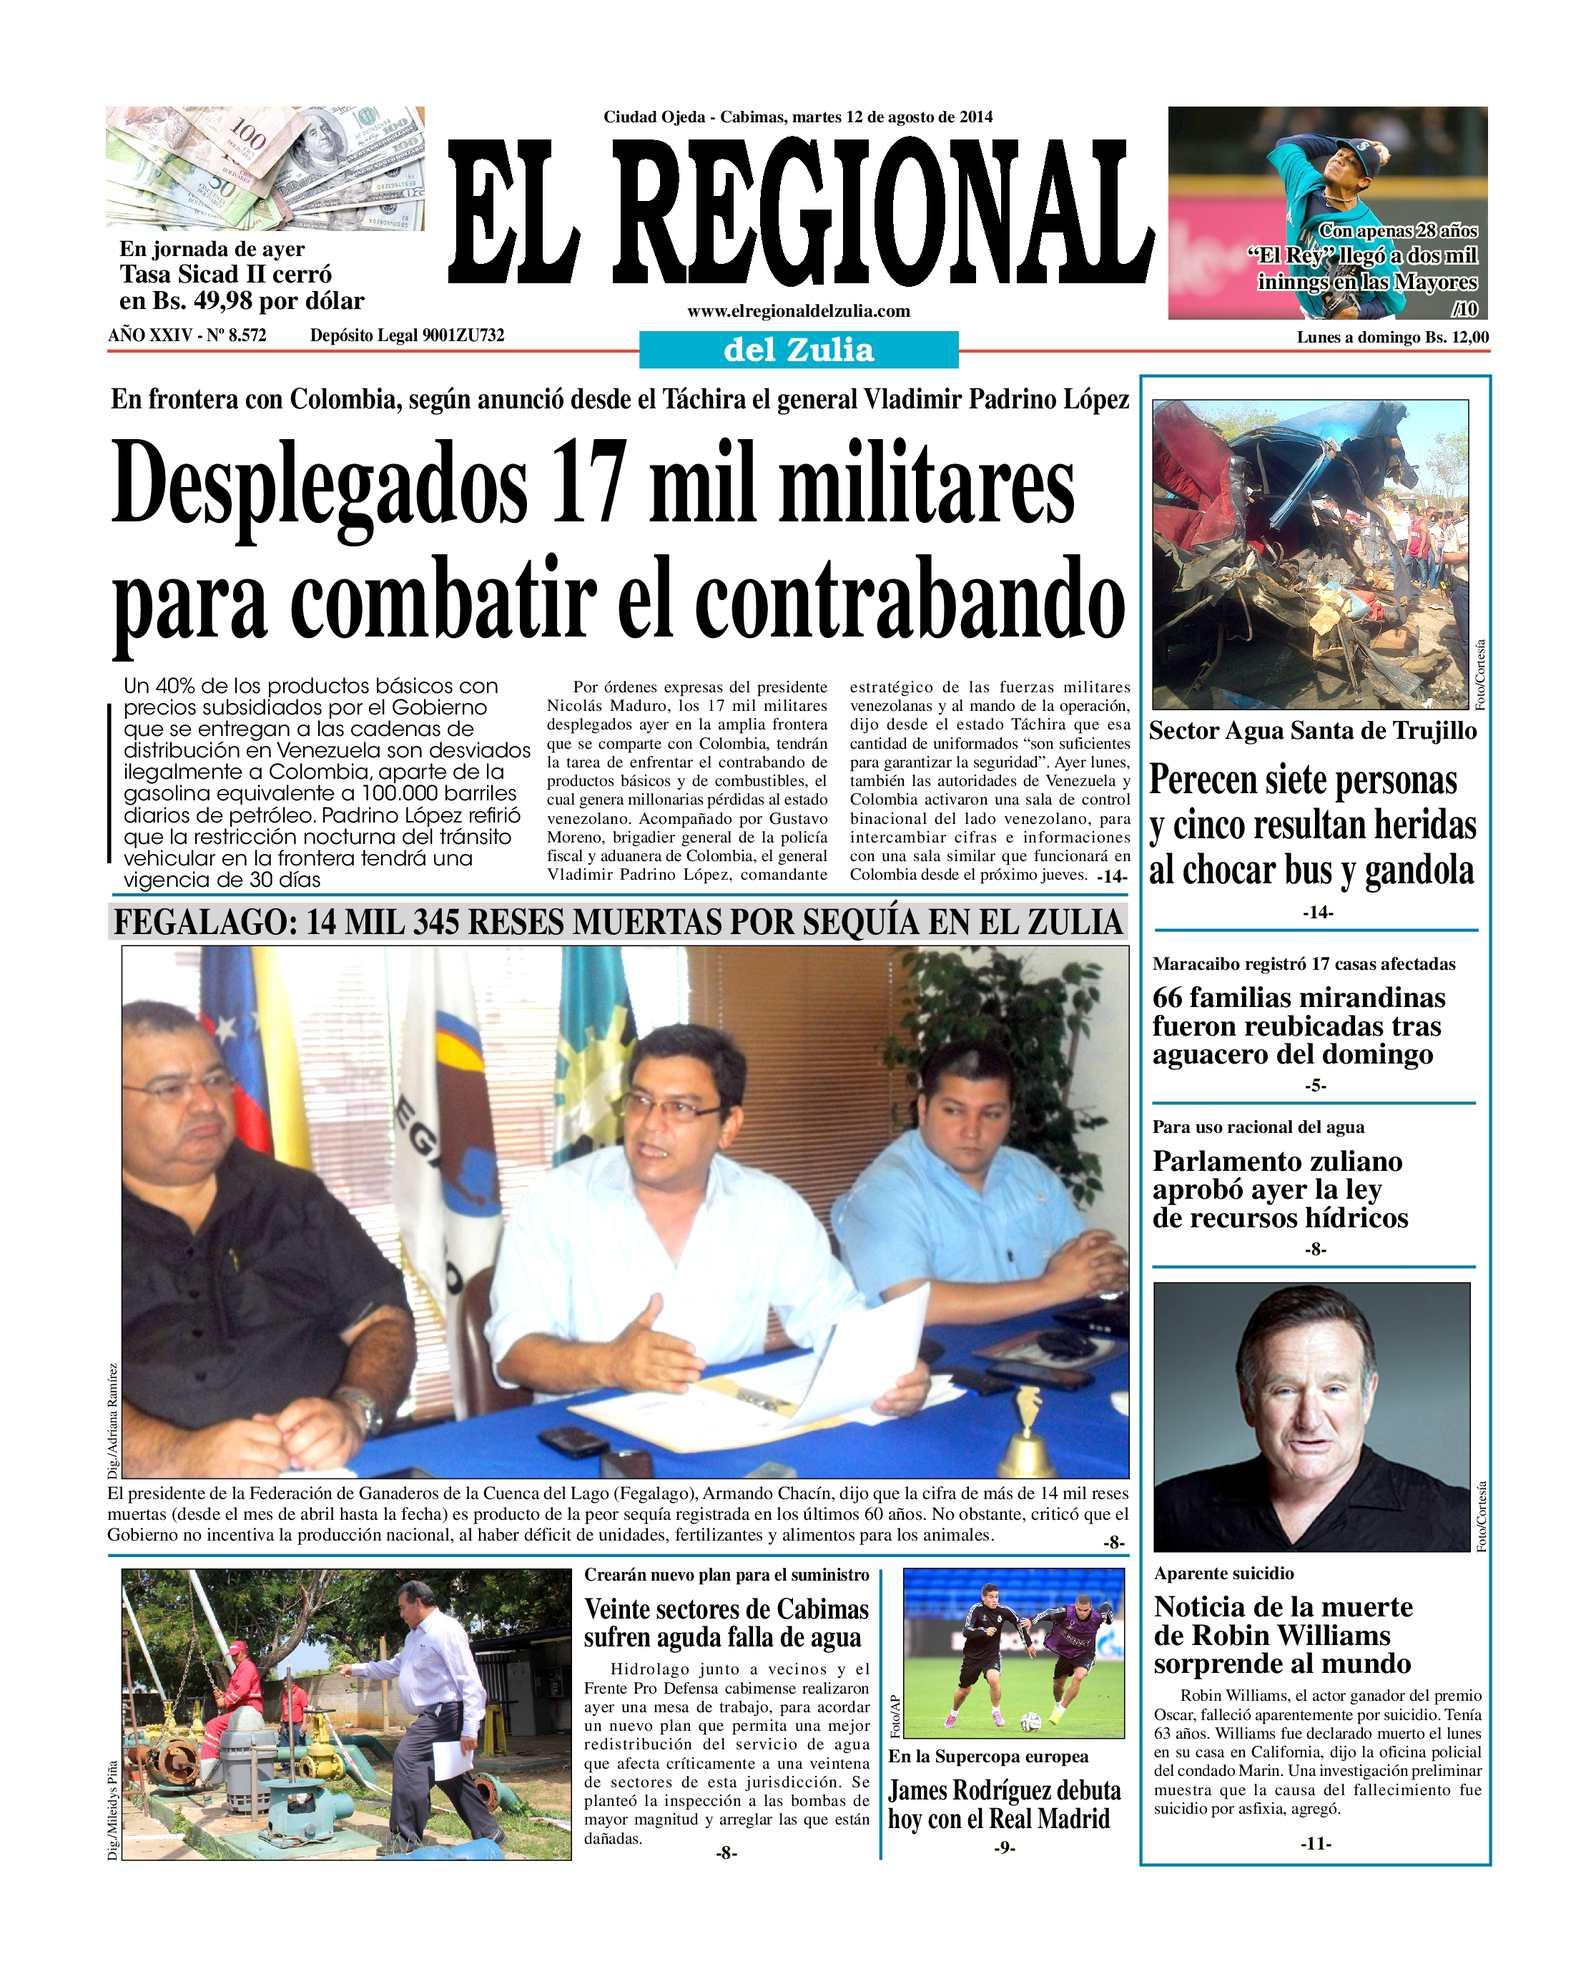 Calaméo - El Regional del Zulia 12-08-2014